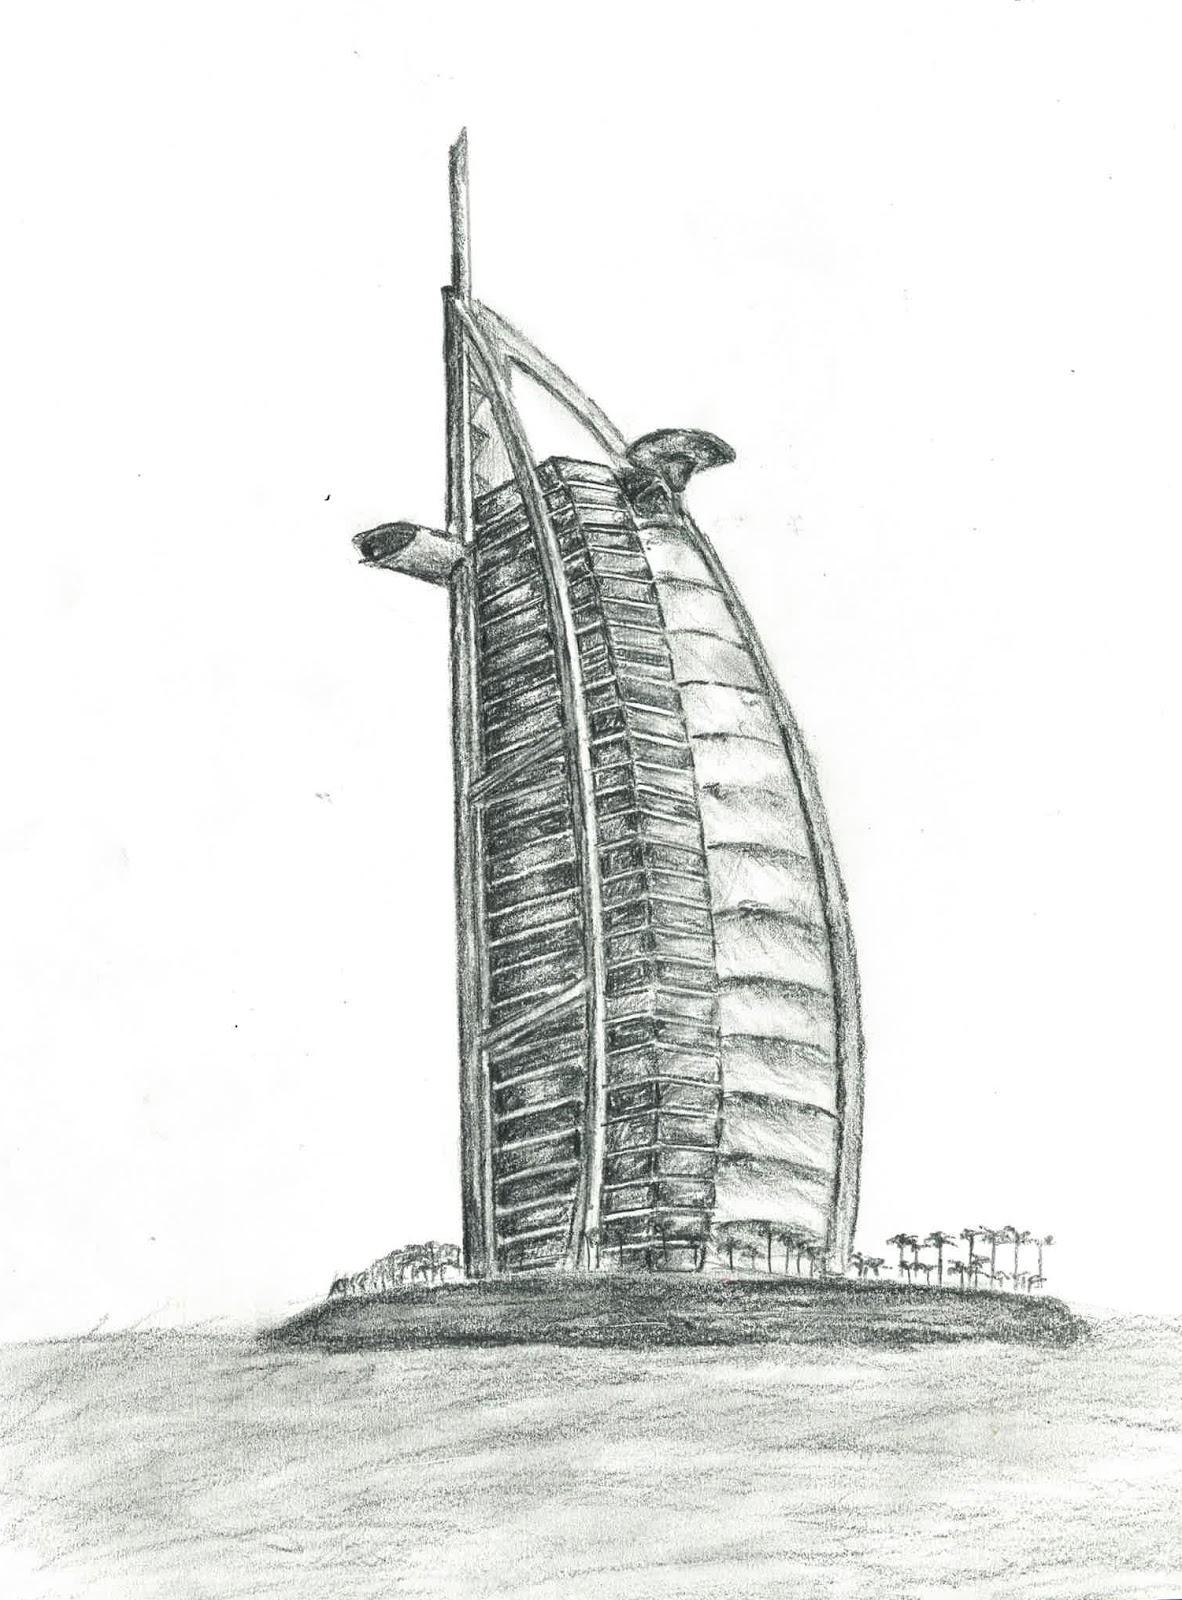 Building I Would Like To Visit Burj Al Arab 1098454997